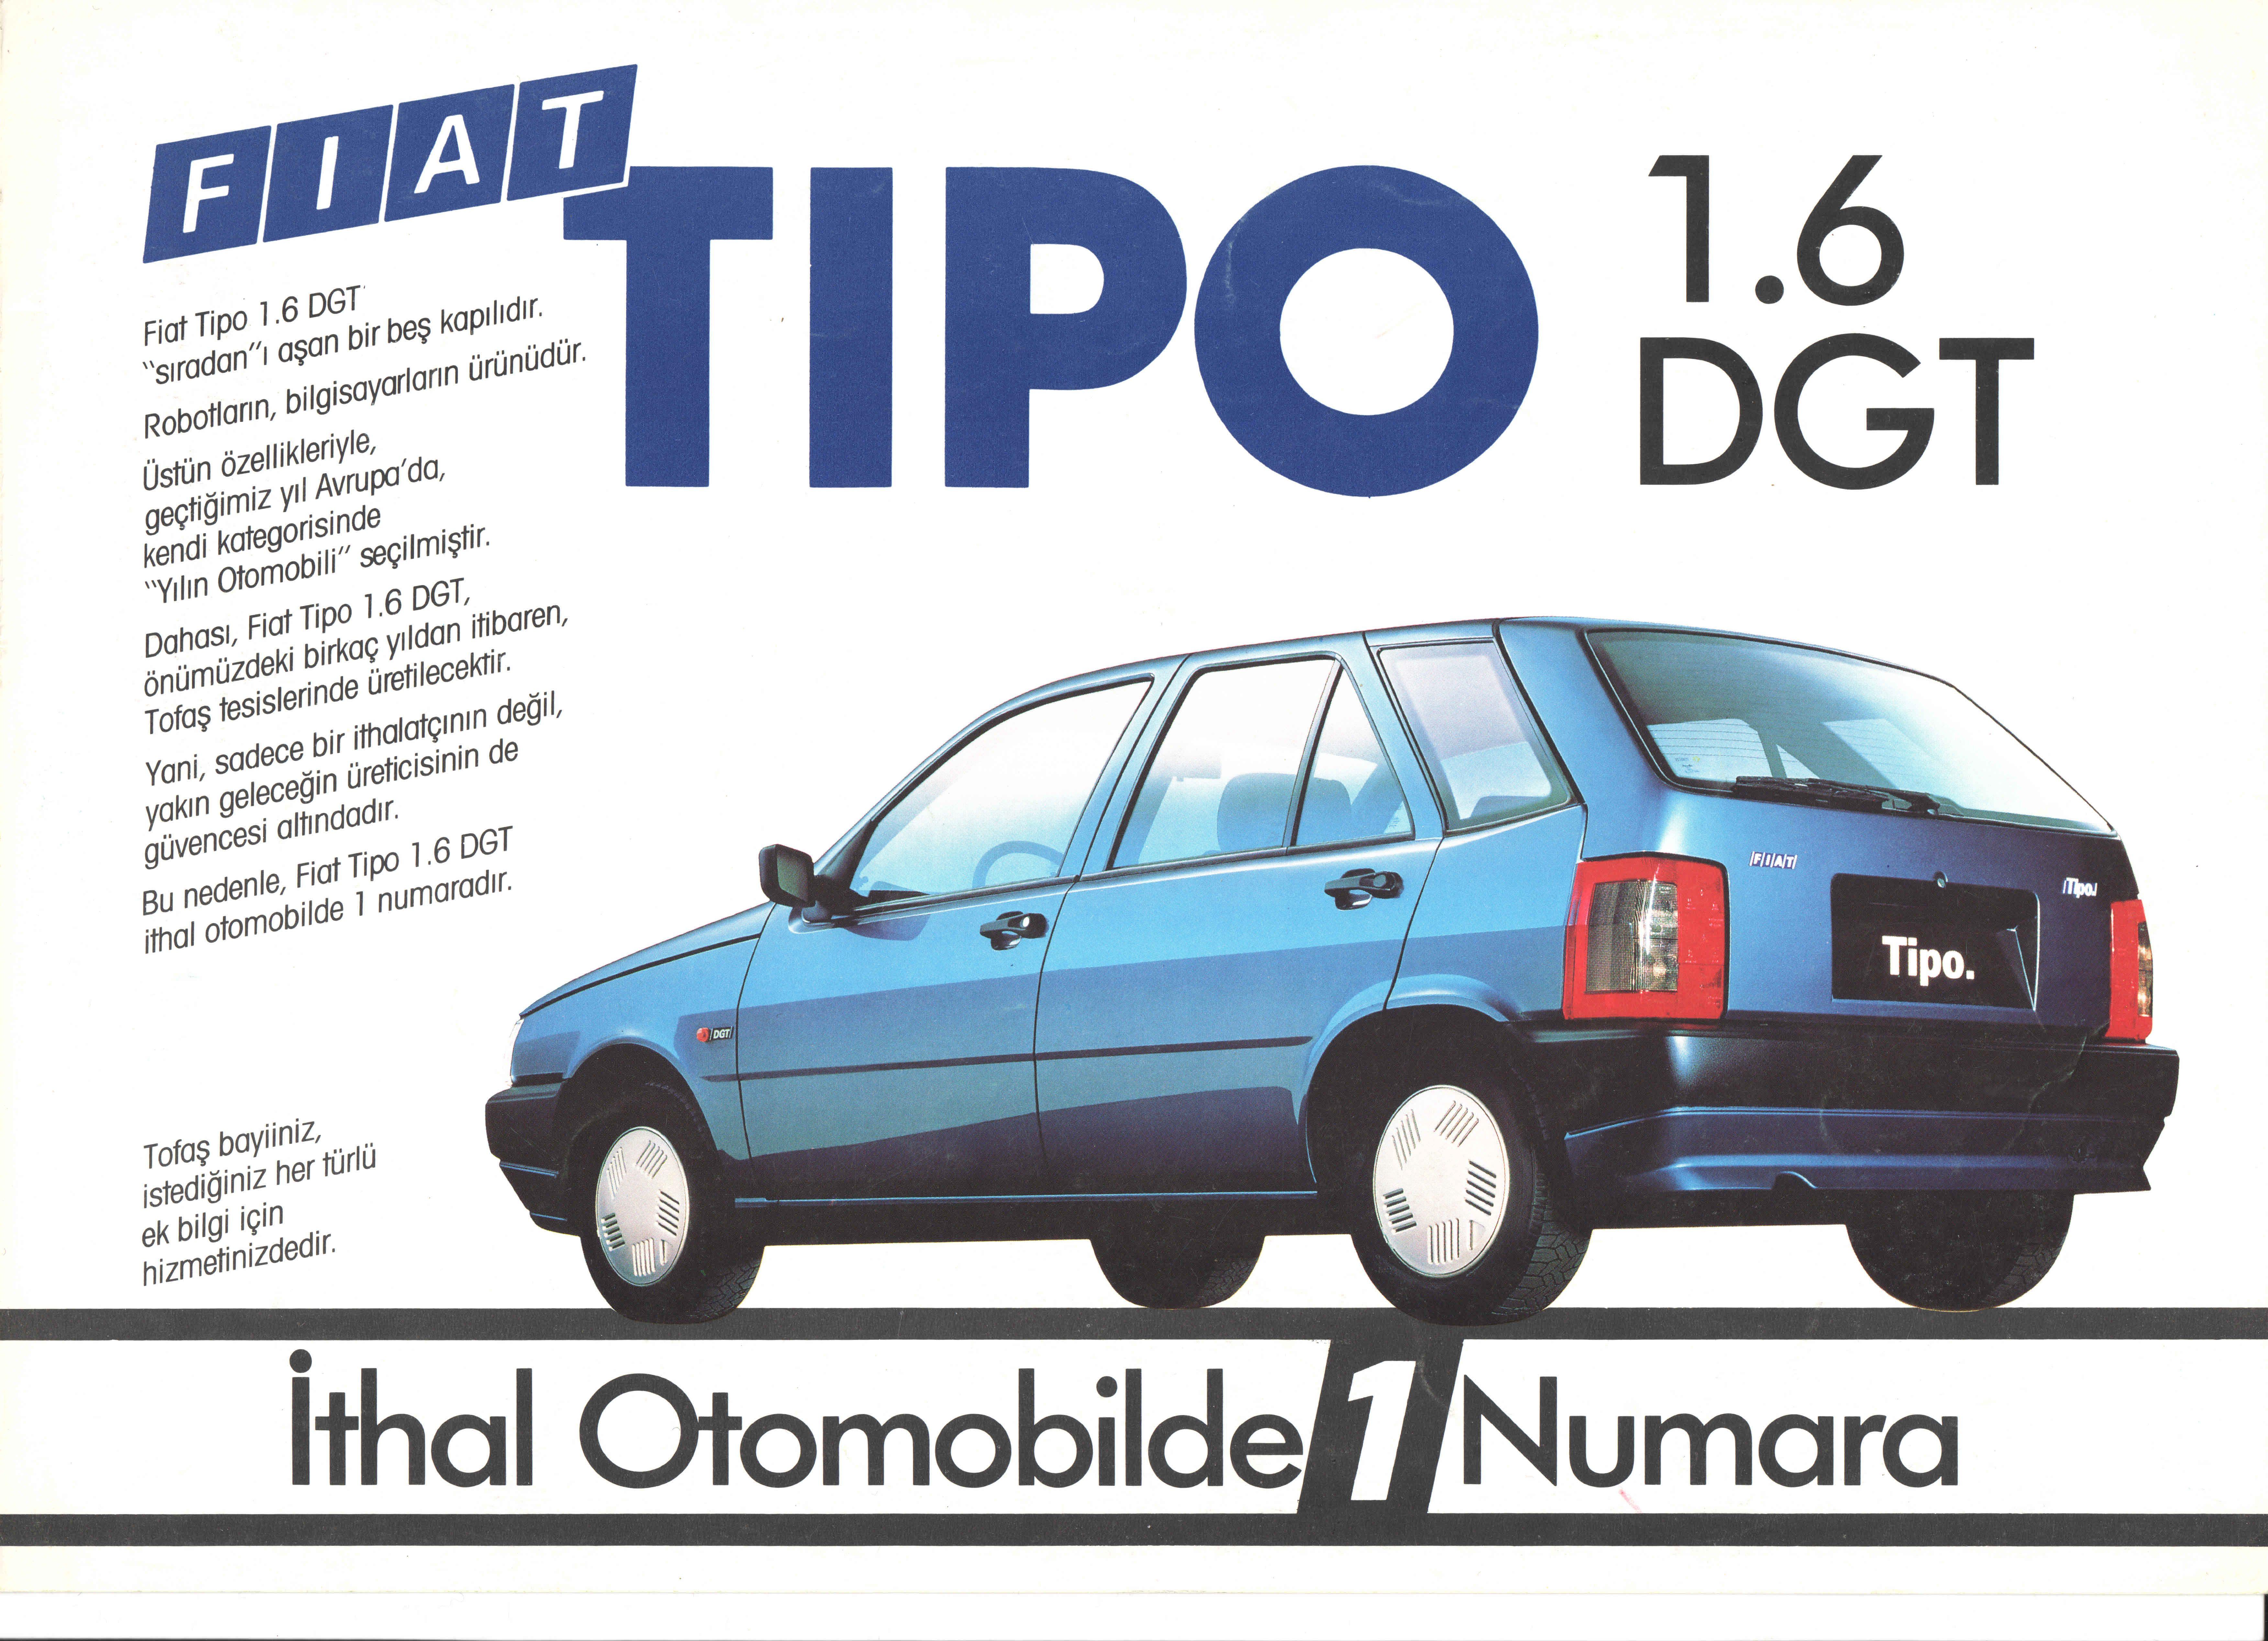 1989 fiat tipo turkish catalog page 1 2 1989 fiat tipo t rk e katalog sayfa